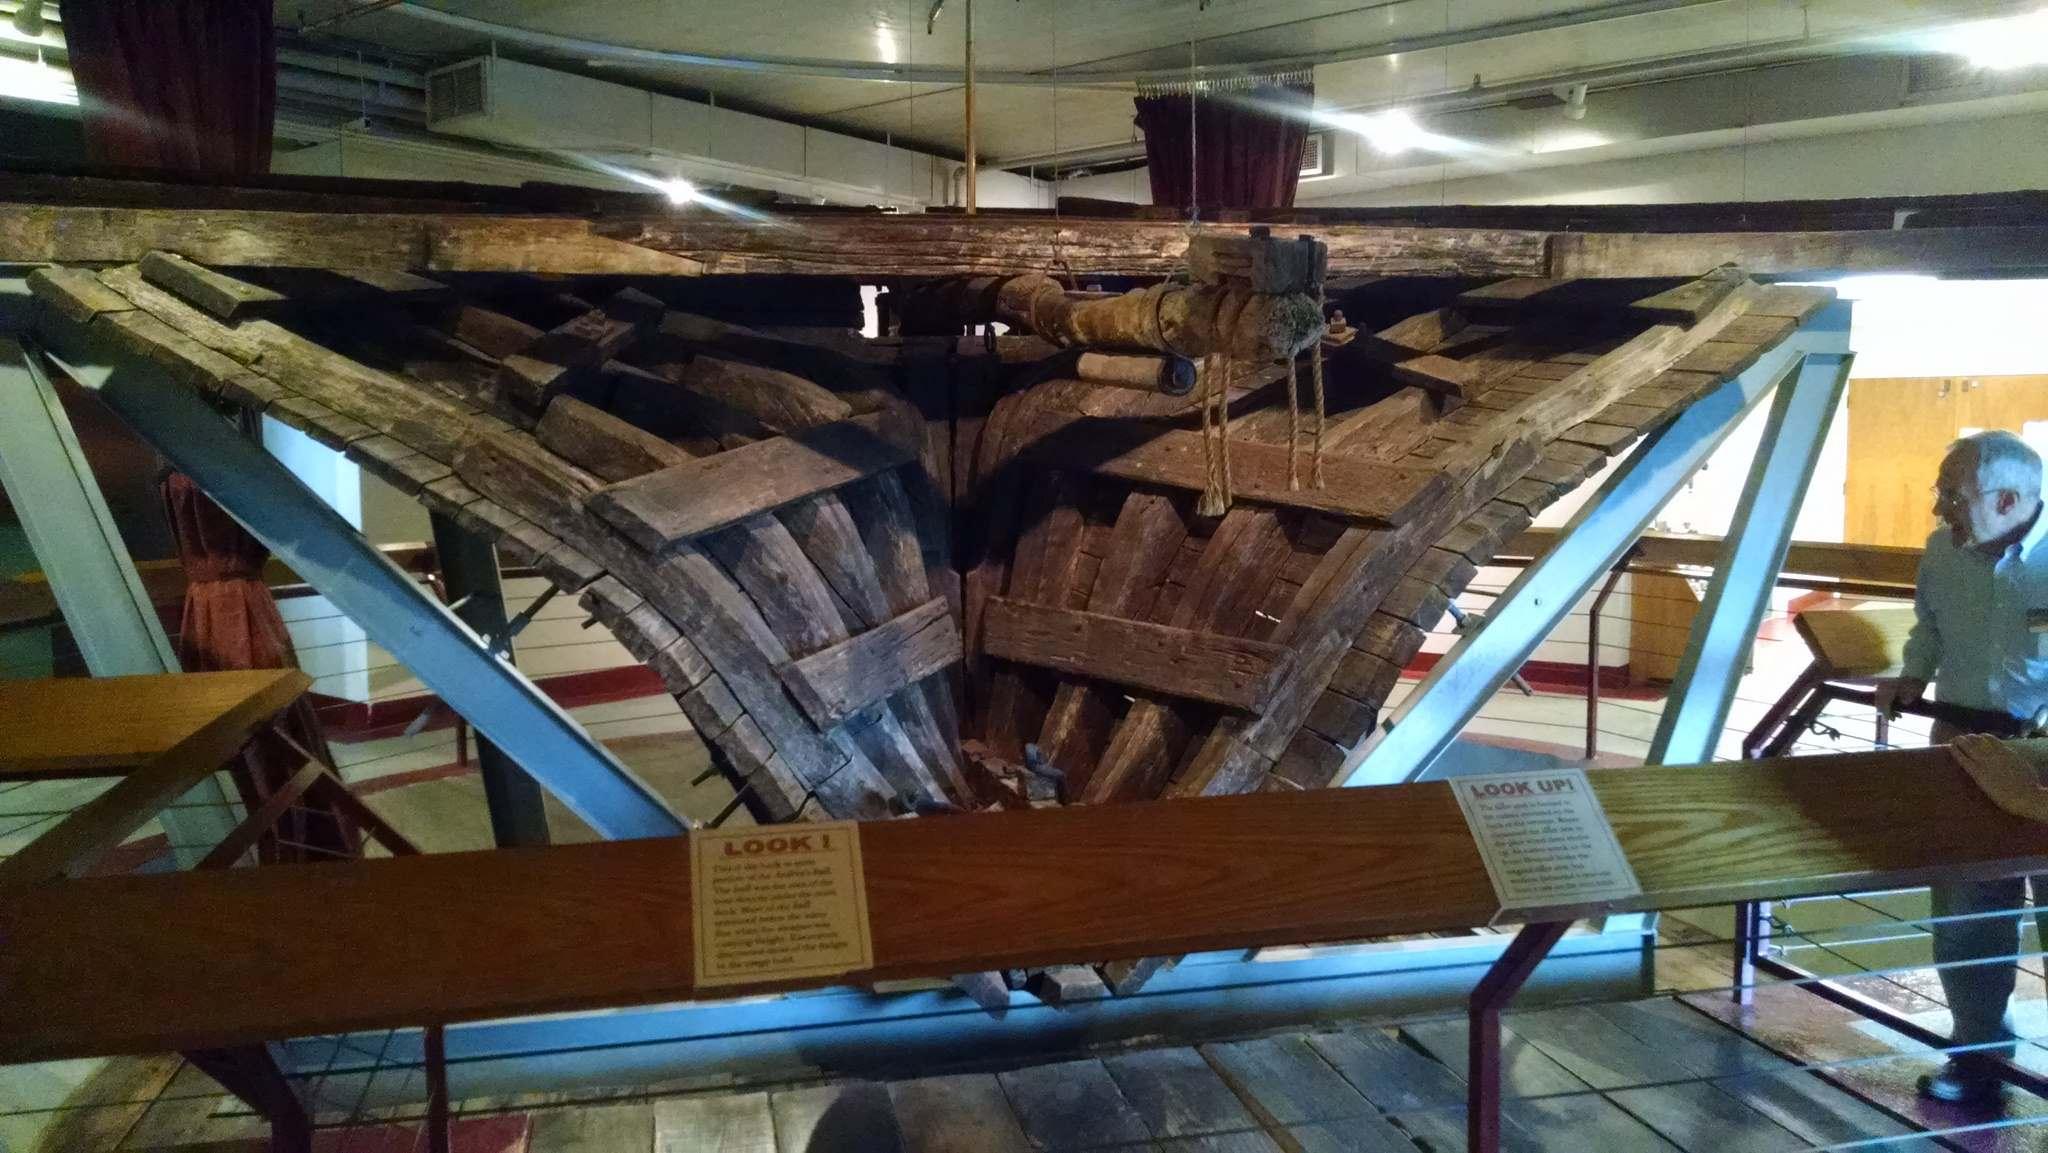 steamboat arabia4 History of Pioneering Midwest   Steamboat Arabia Museum in Kansas City